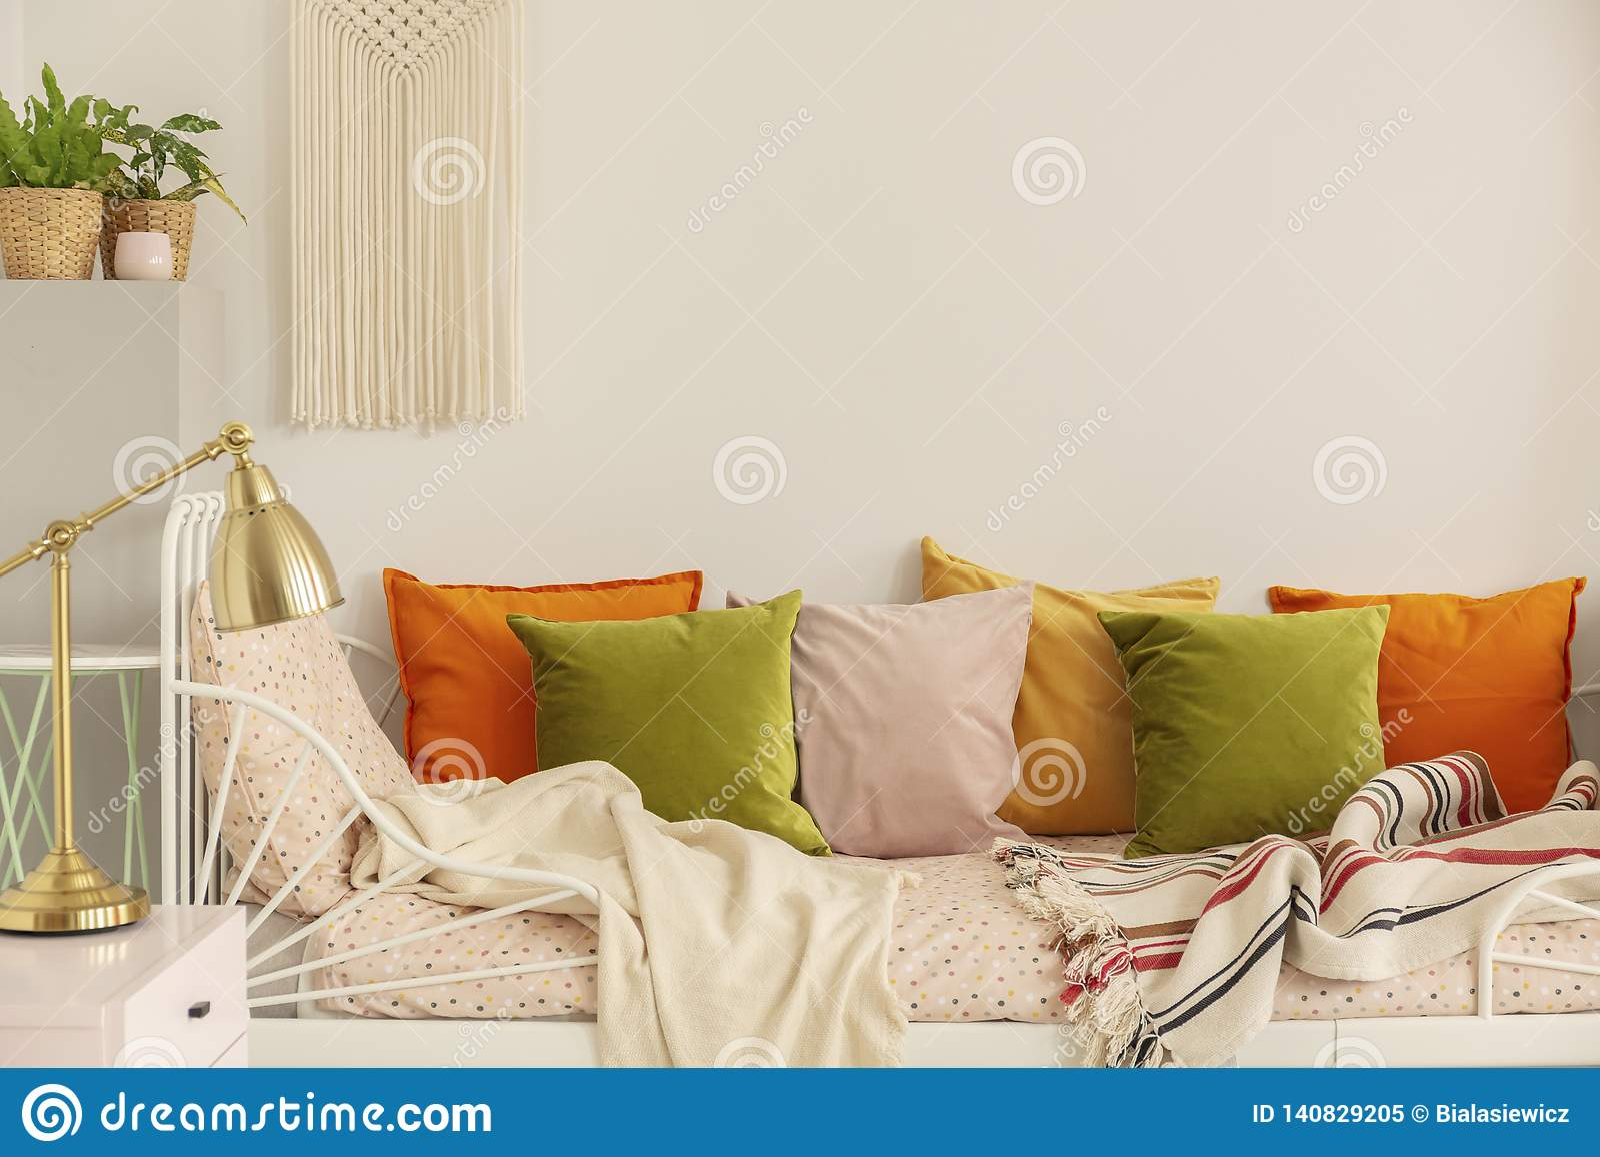 Gouden lamp op nightstand naast groene olijf, pastelkleur roze, gele en oranje hoofdkussens op enig metaalbed met gevormd